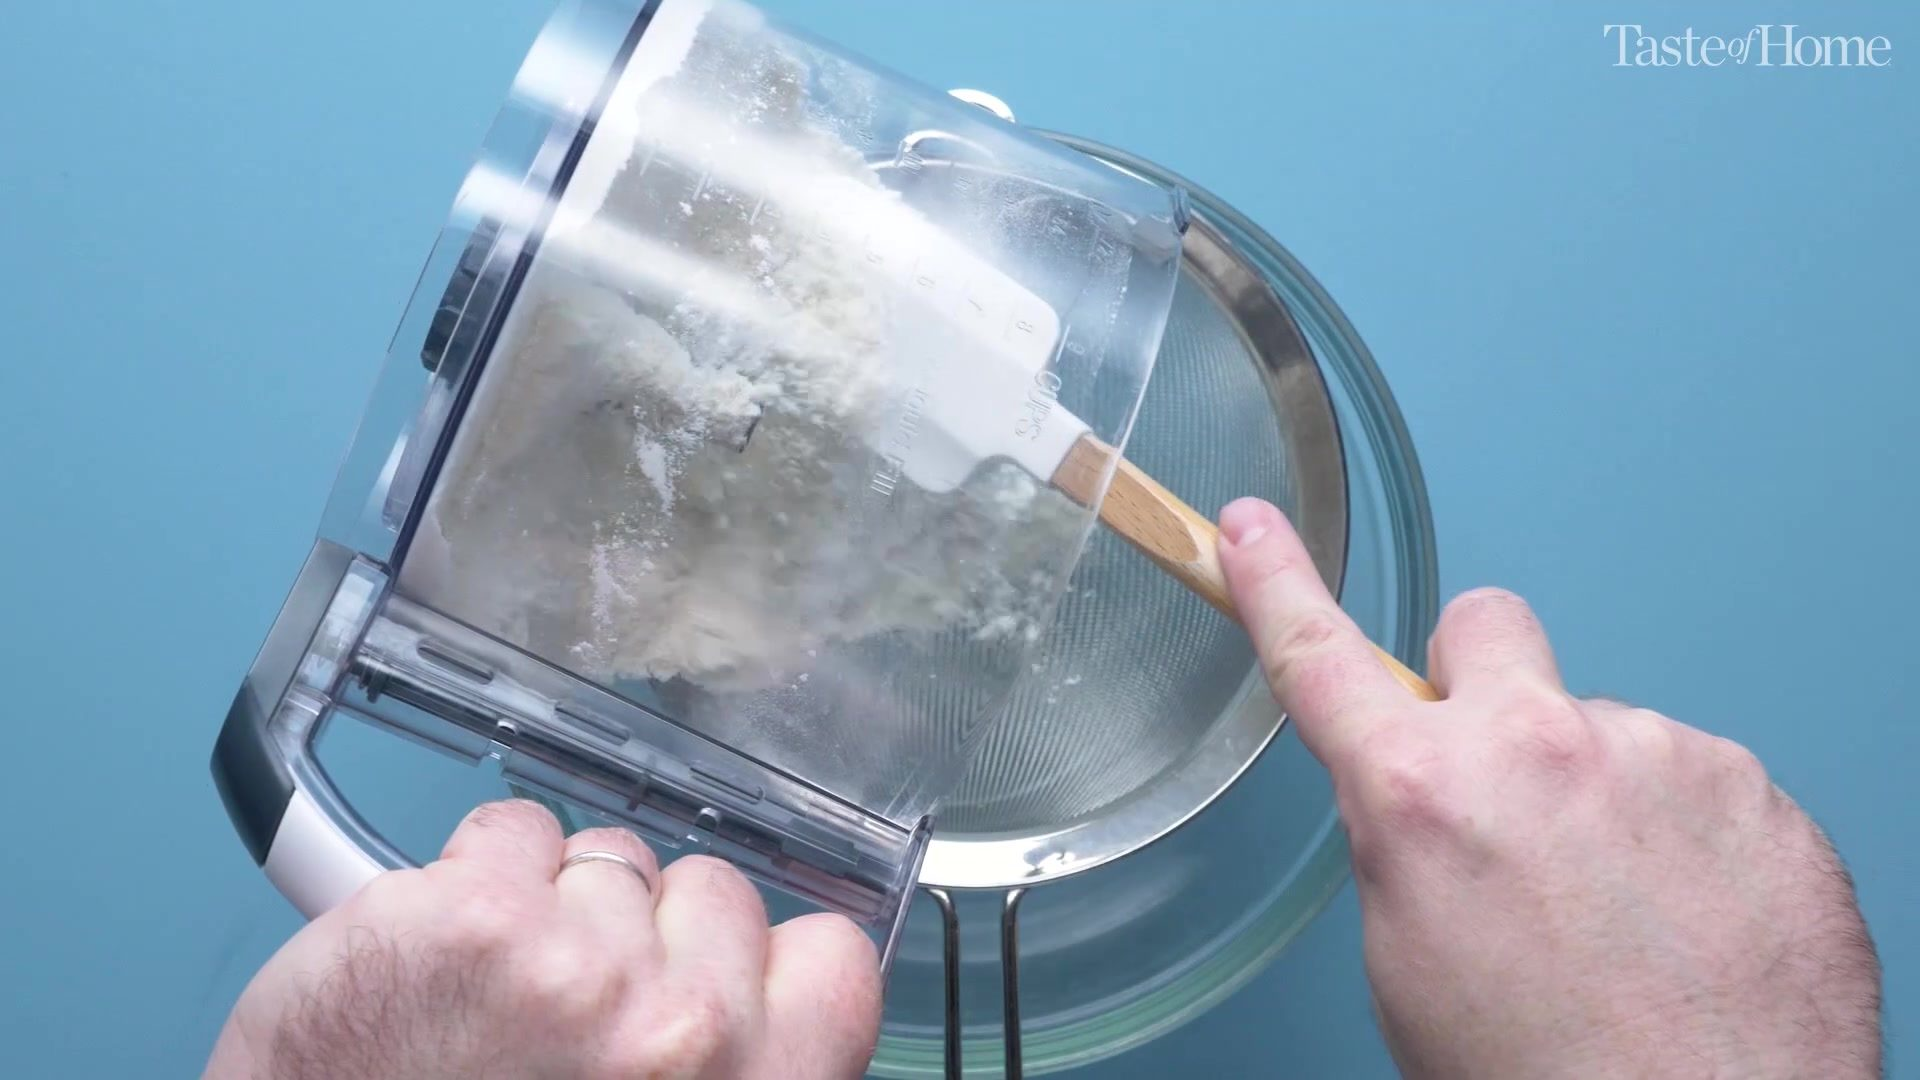 Macaron almond flour and confectioner sugar mixture